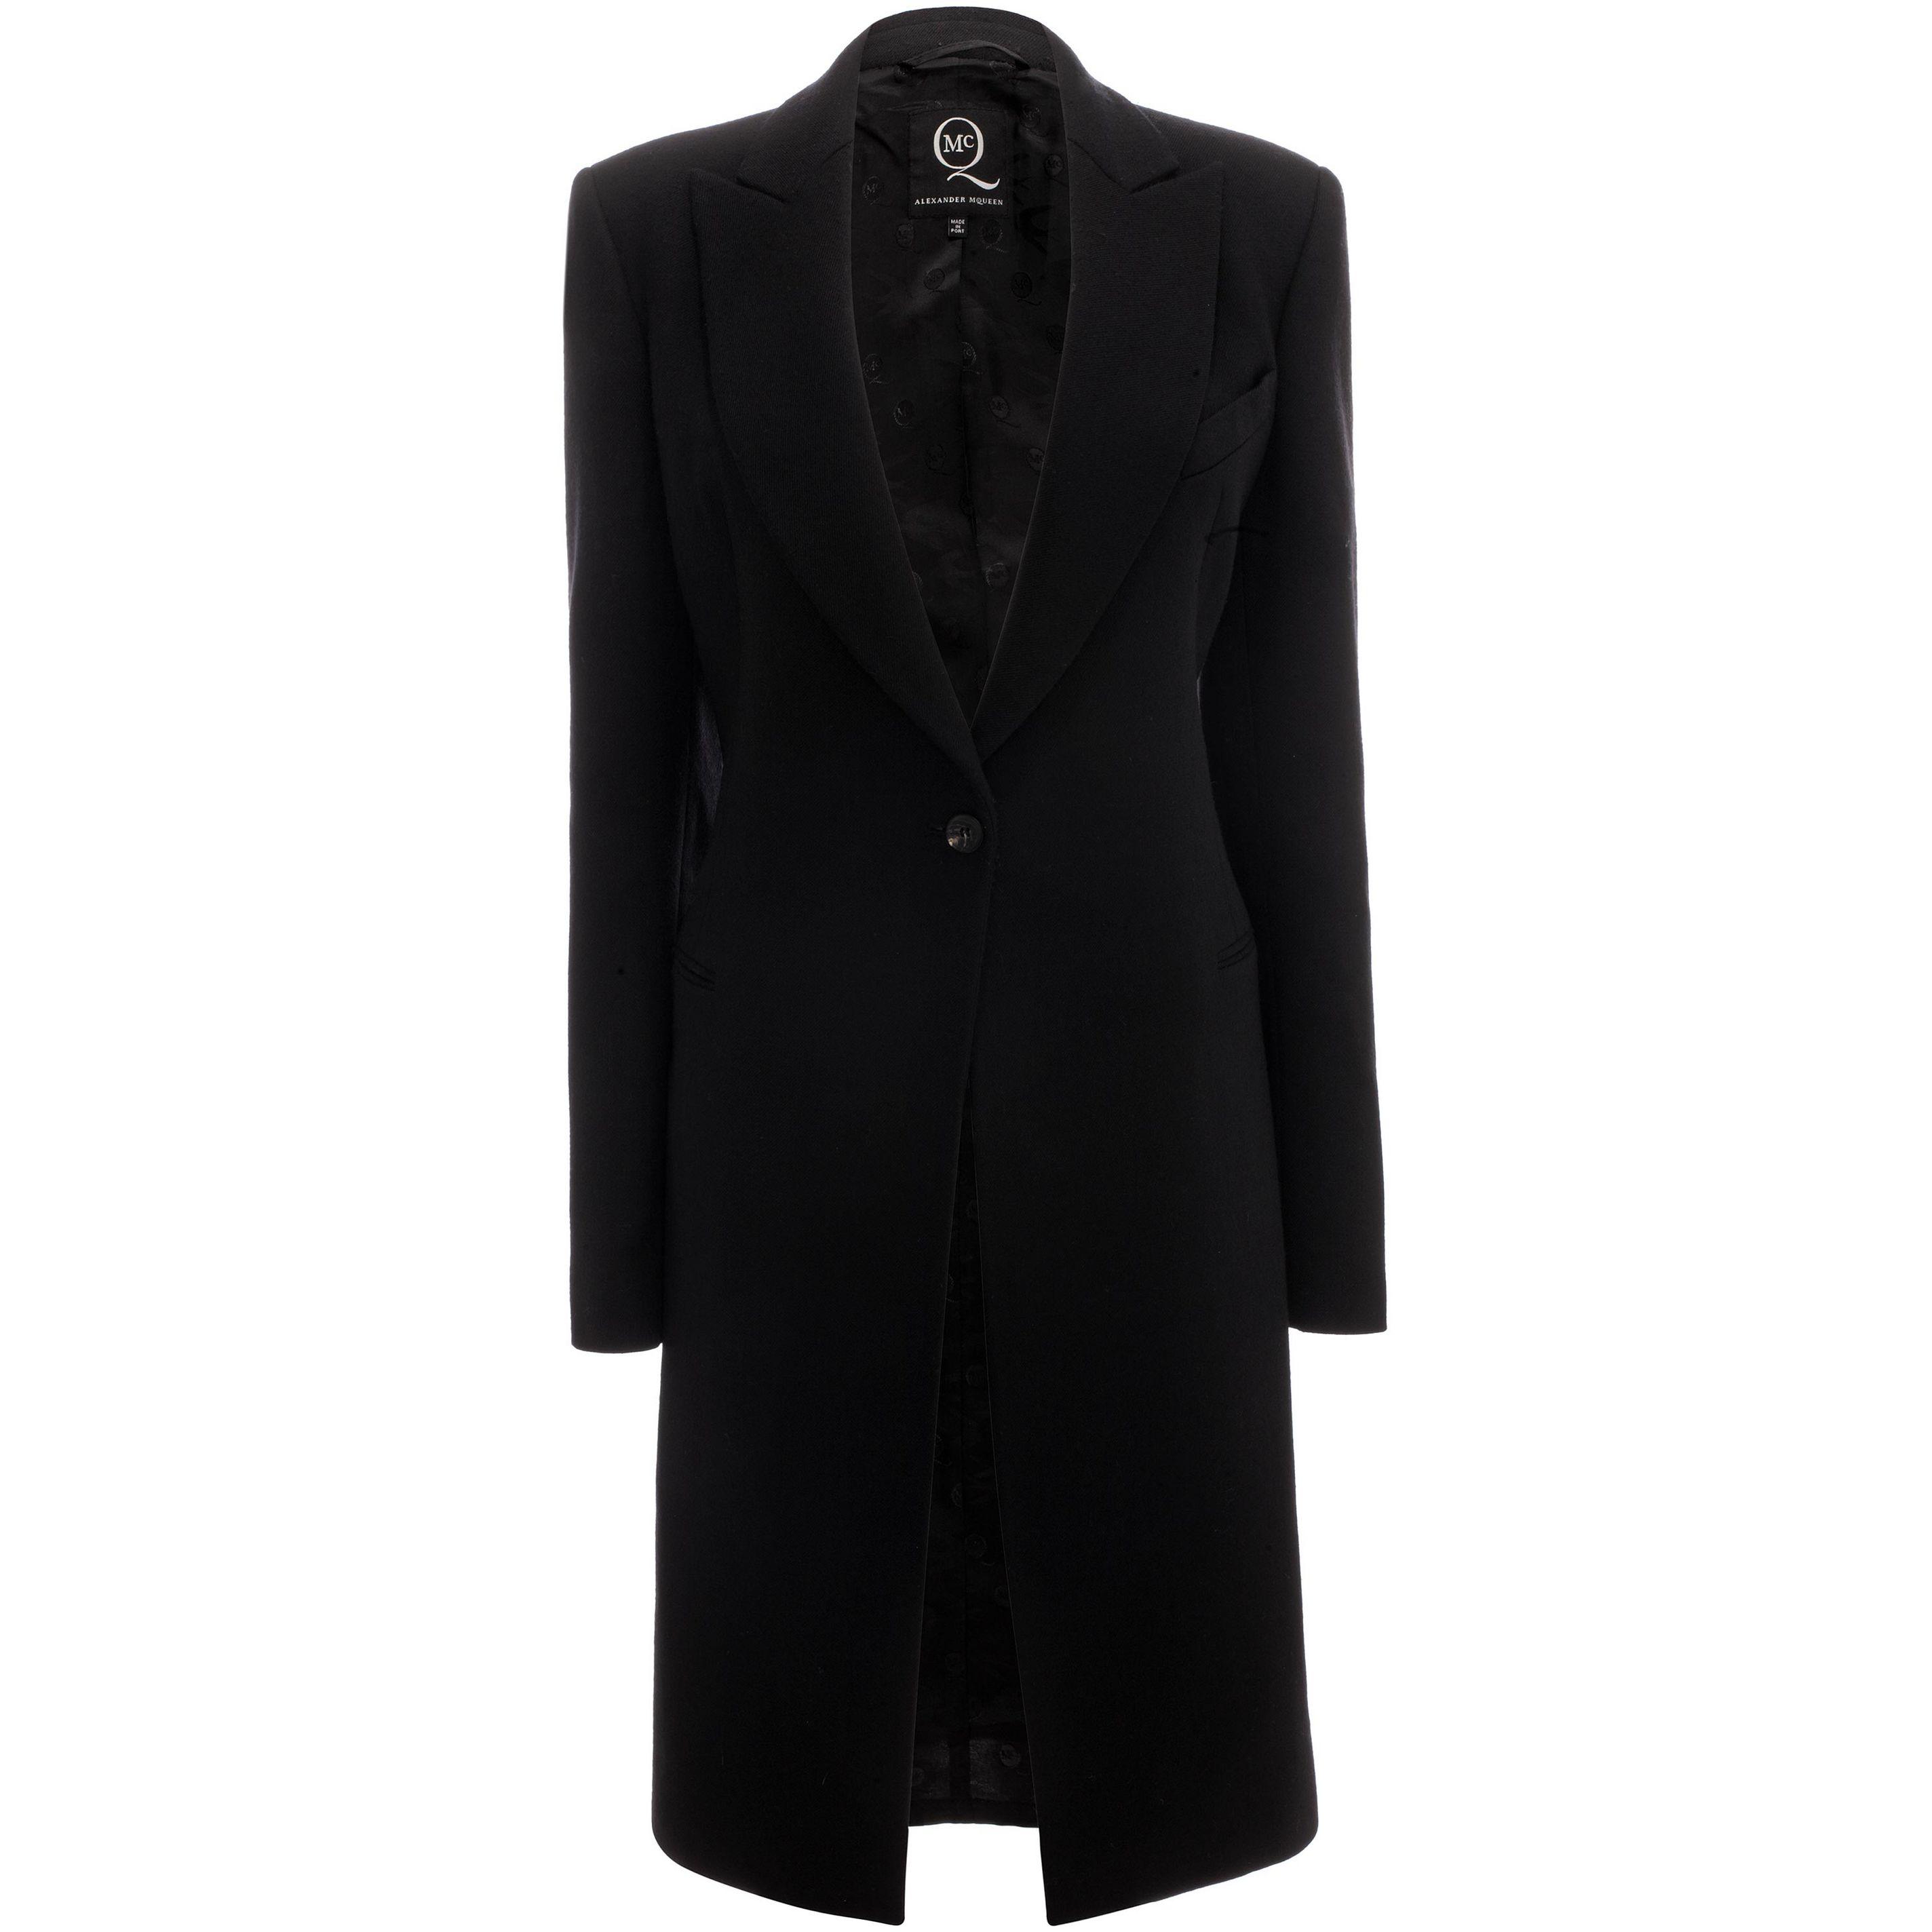 Wear on mcq alexander mcqueen online store